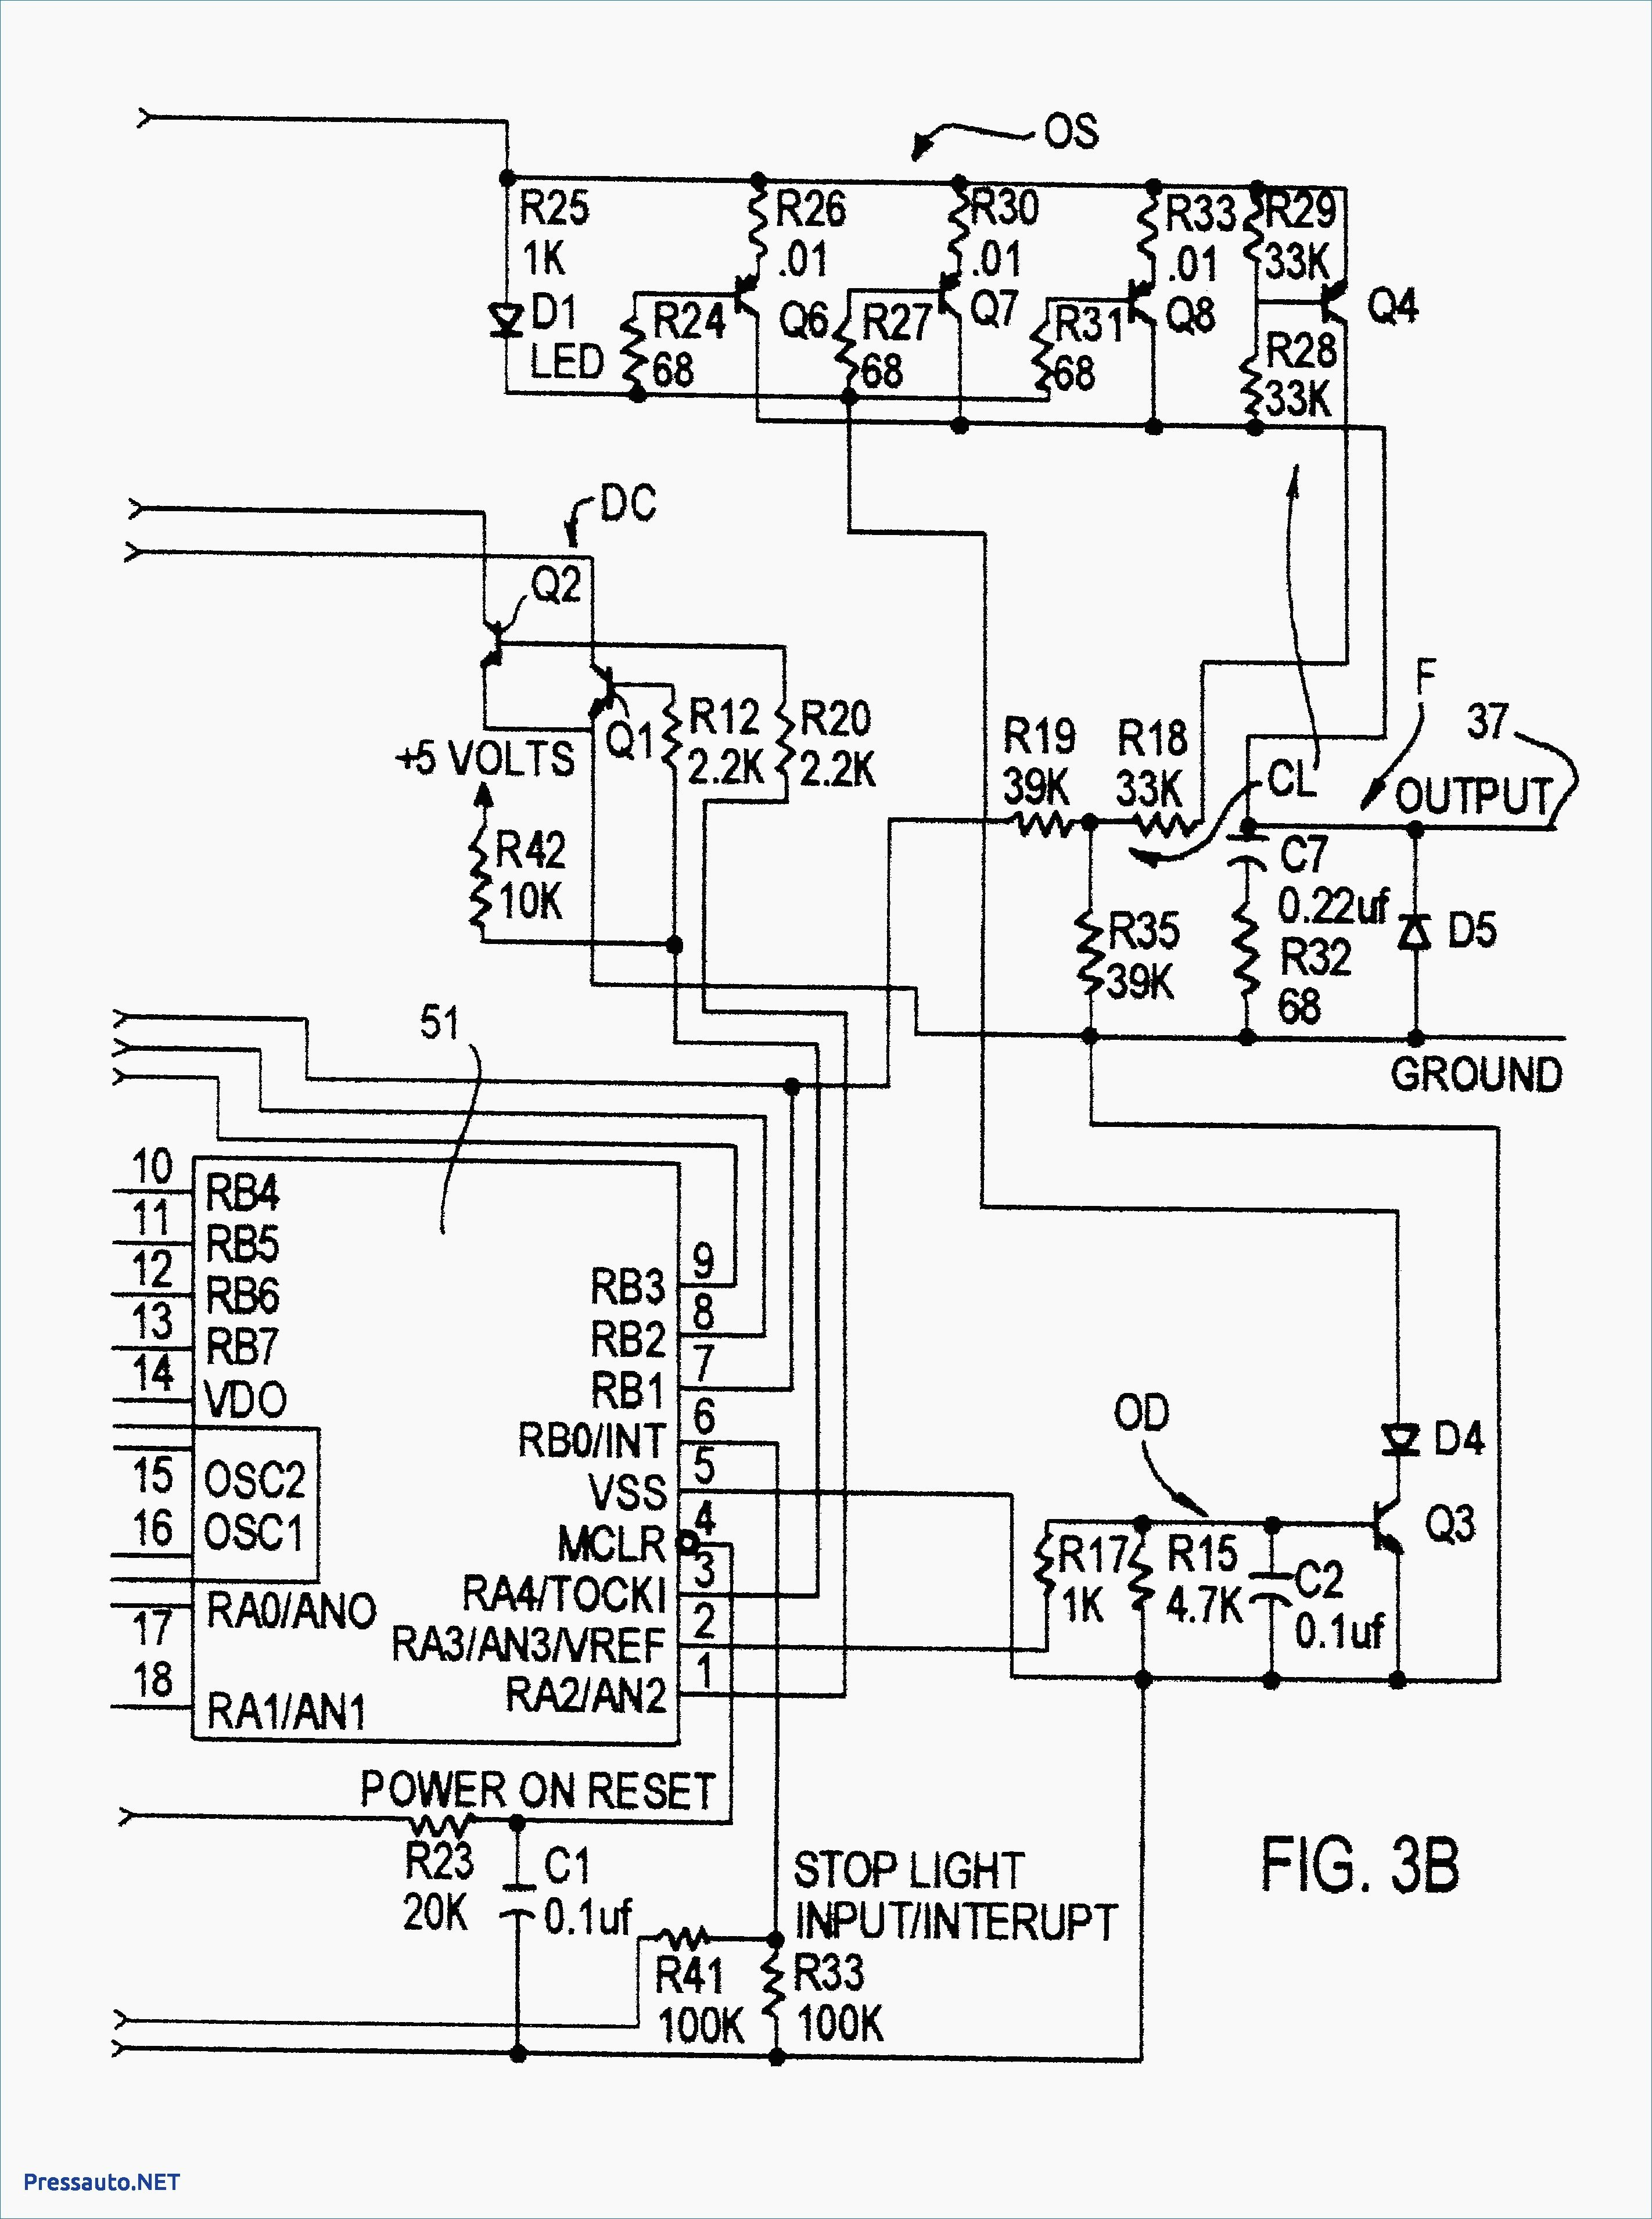 big dog motorcycle wiring diagram elegant wfco 8735 wiring schematic wiring wiring diagrams instructions of big dog motorcycle wiring diagram